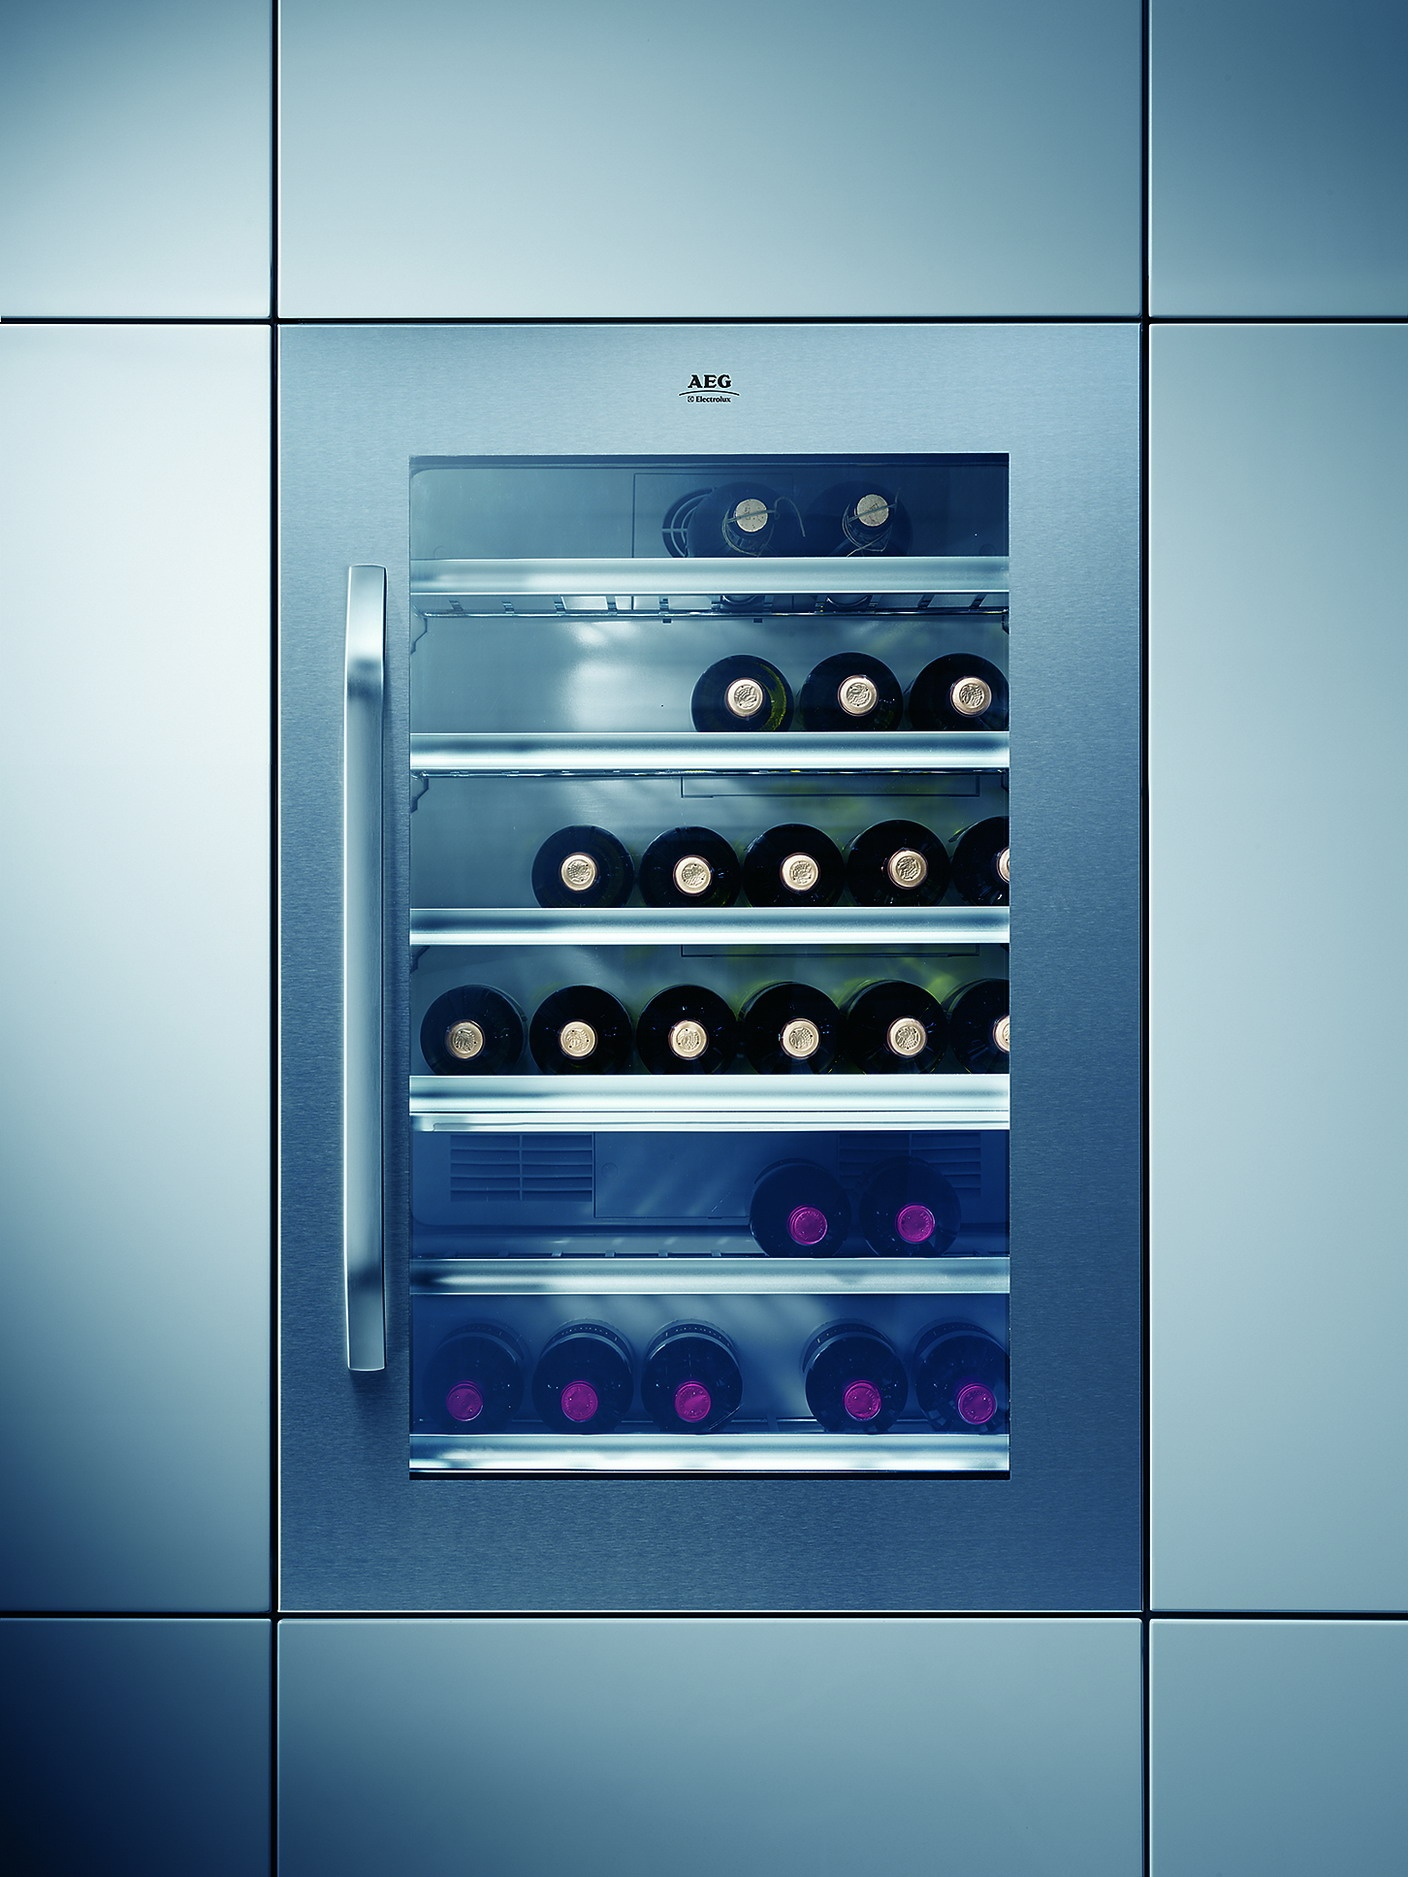 aeg-electrolux-wine-cooler